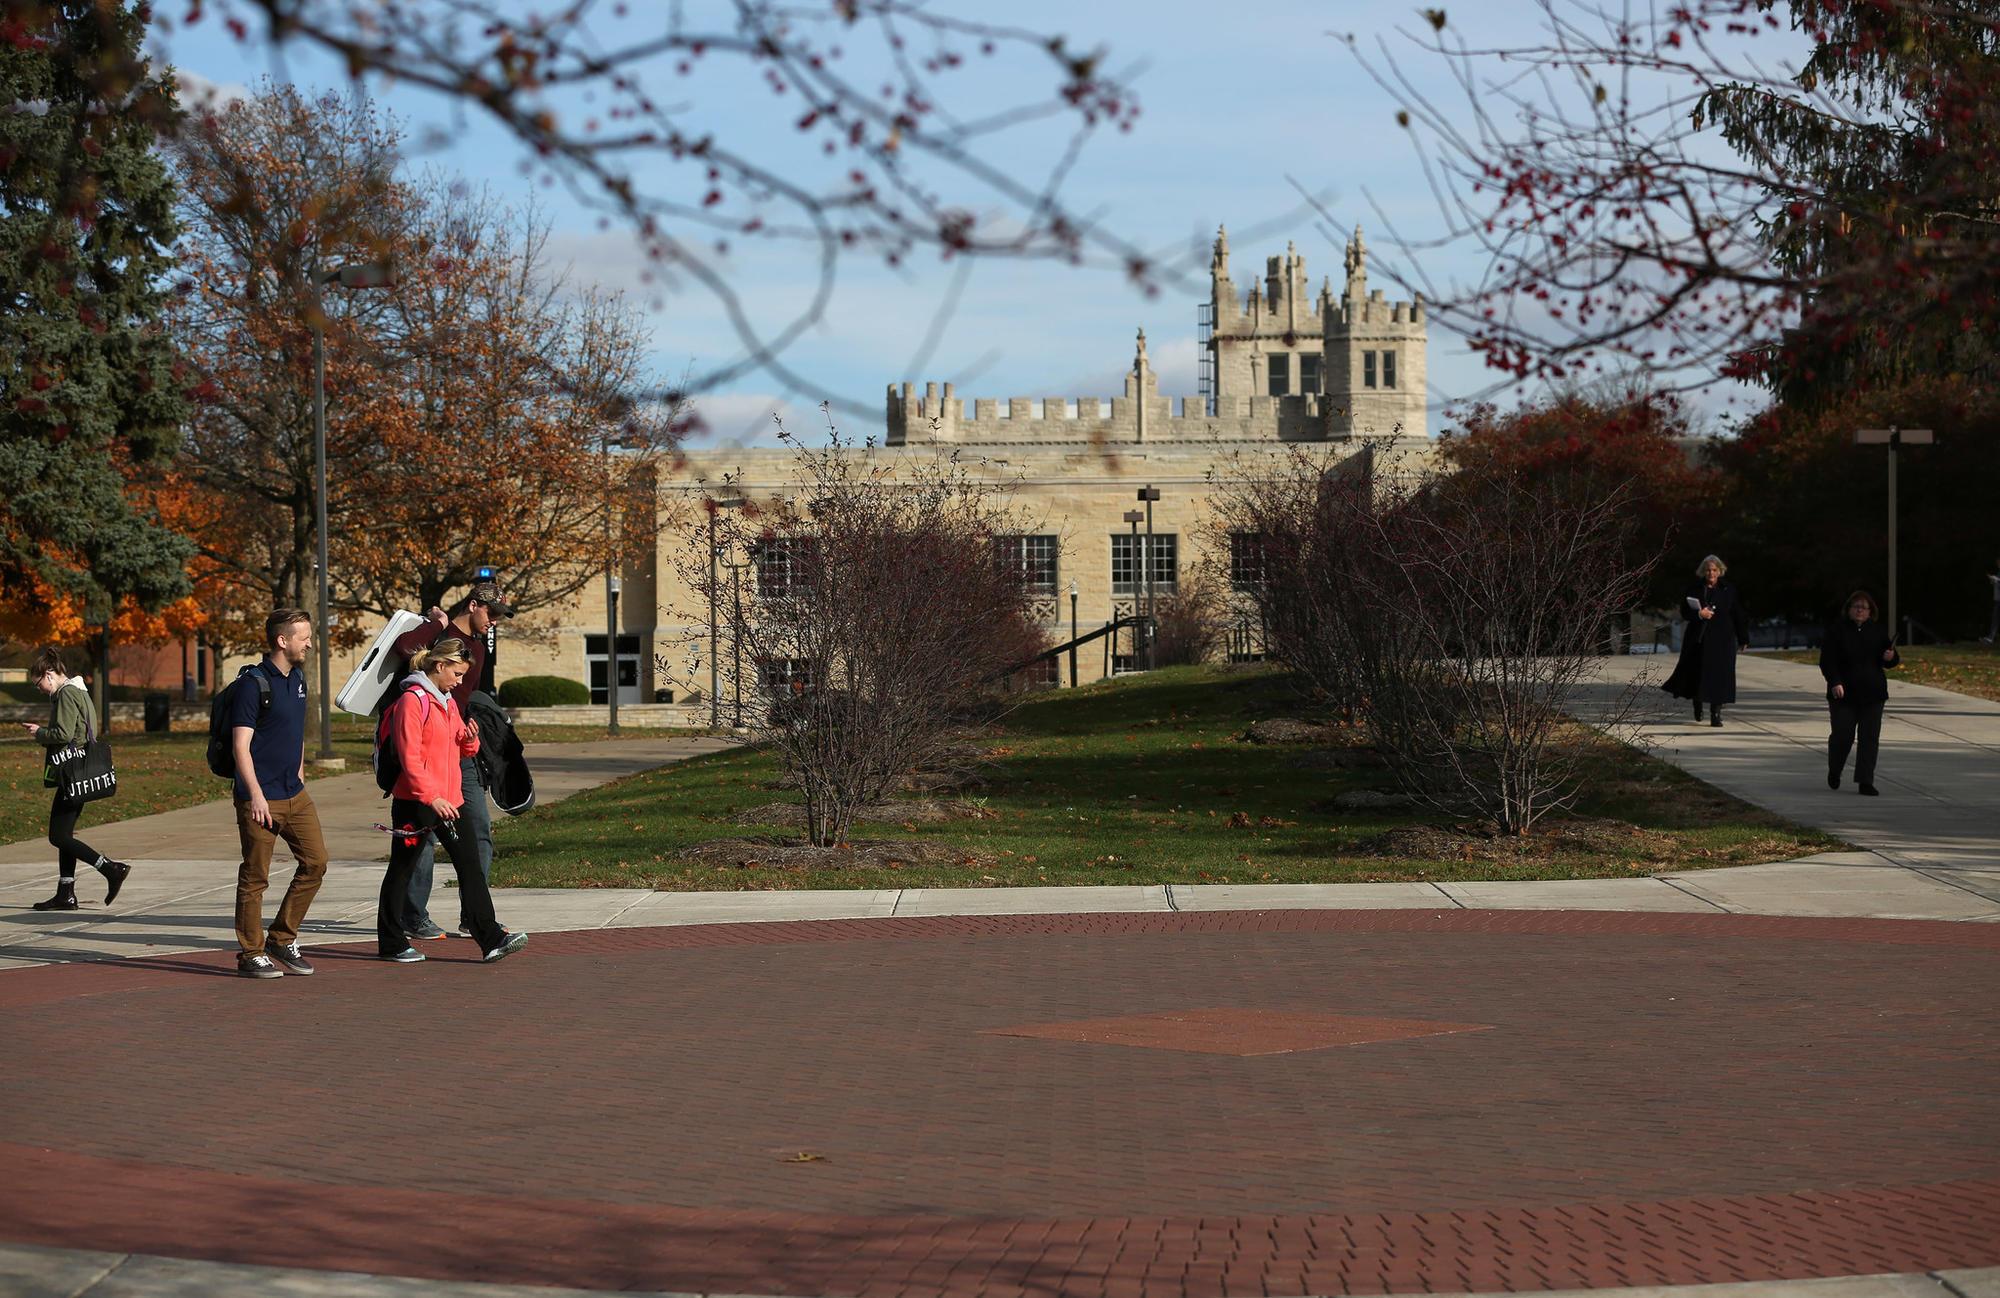 Northern Illinois University board upholds $600K severance for ousted president